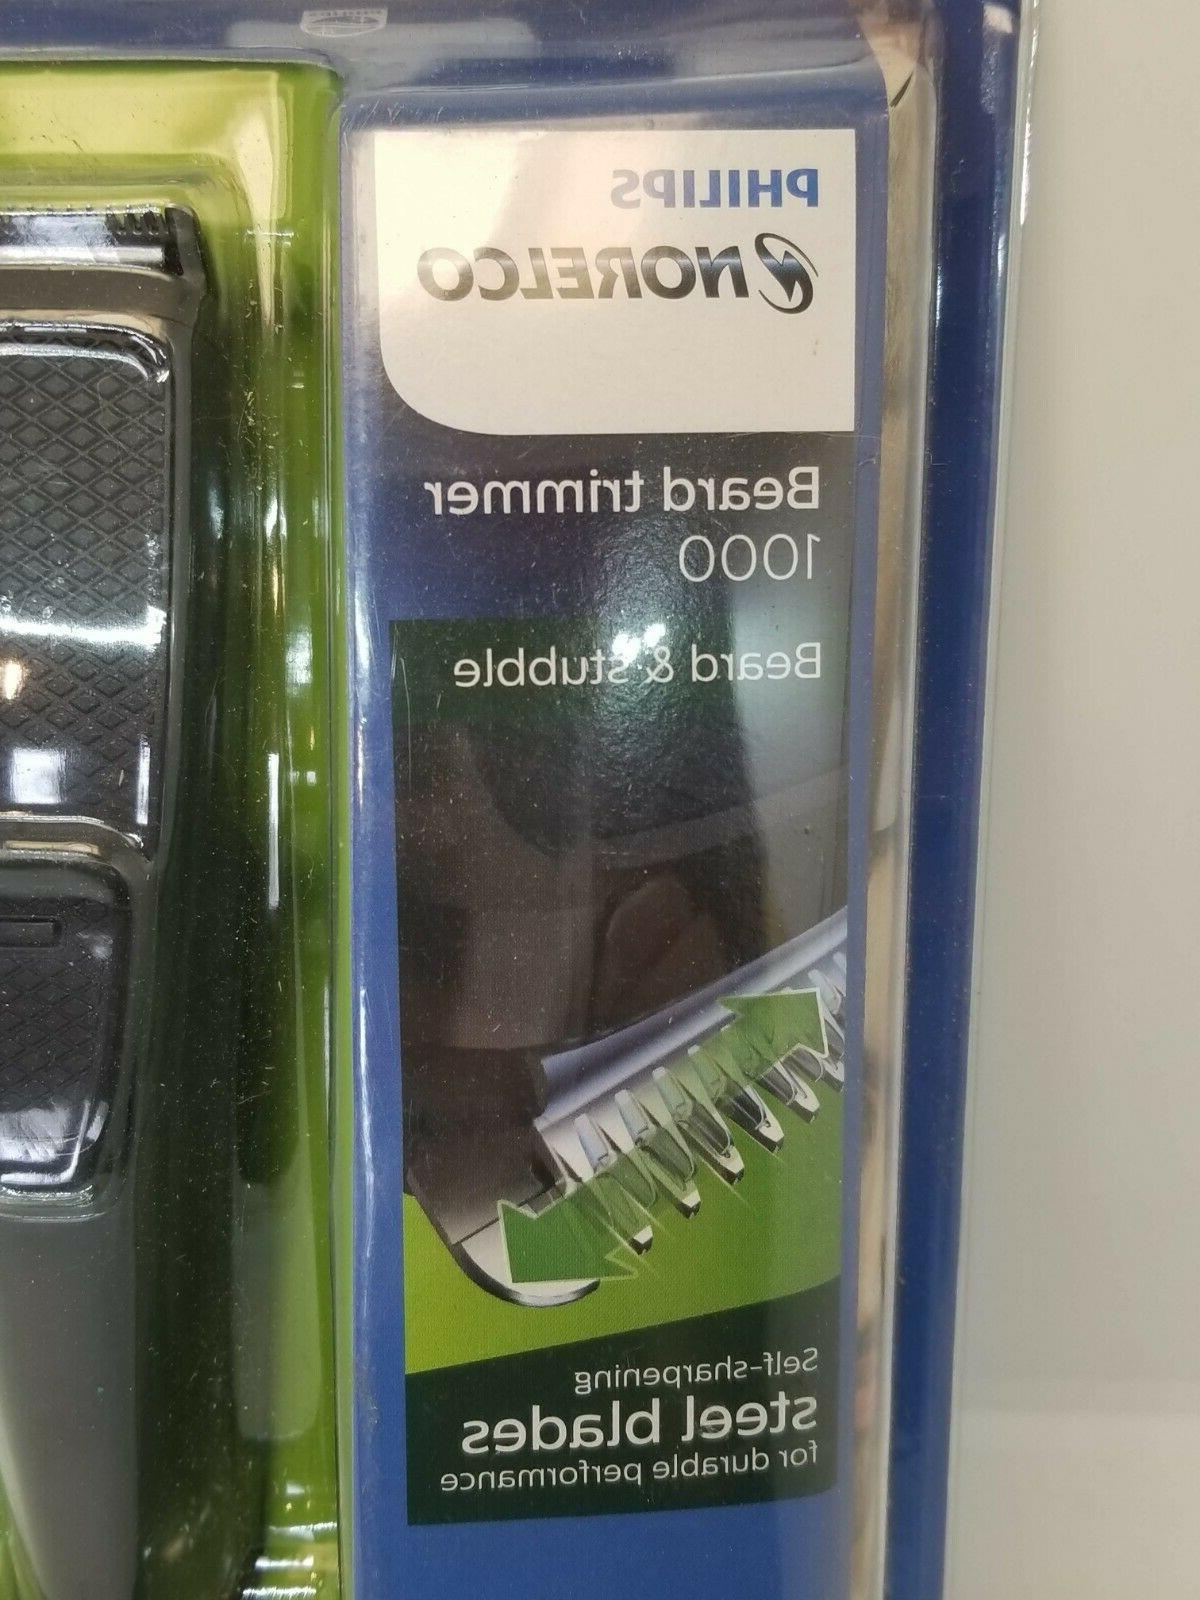 Philips Norelco trimmer 1000 self-sharpening steel blades